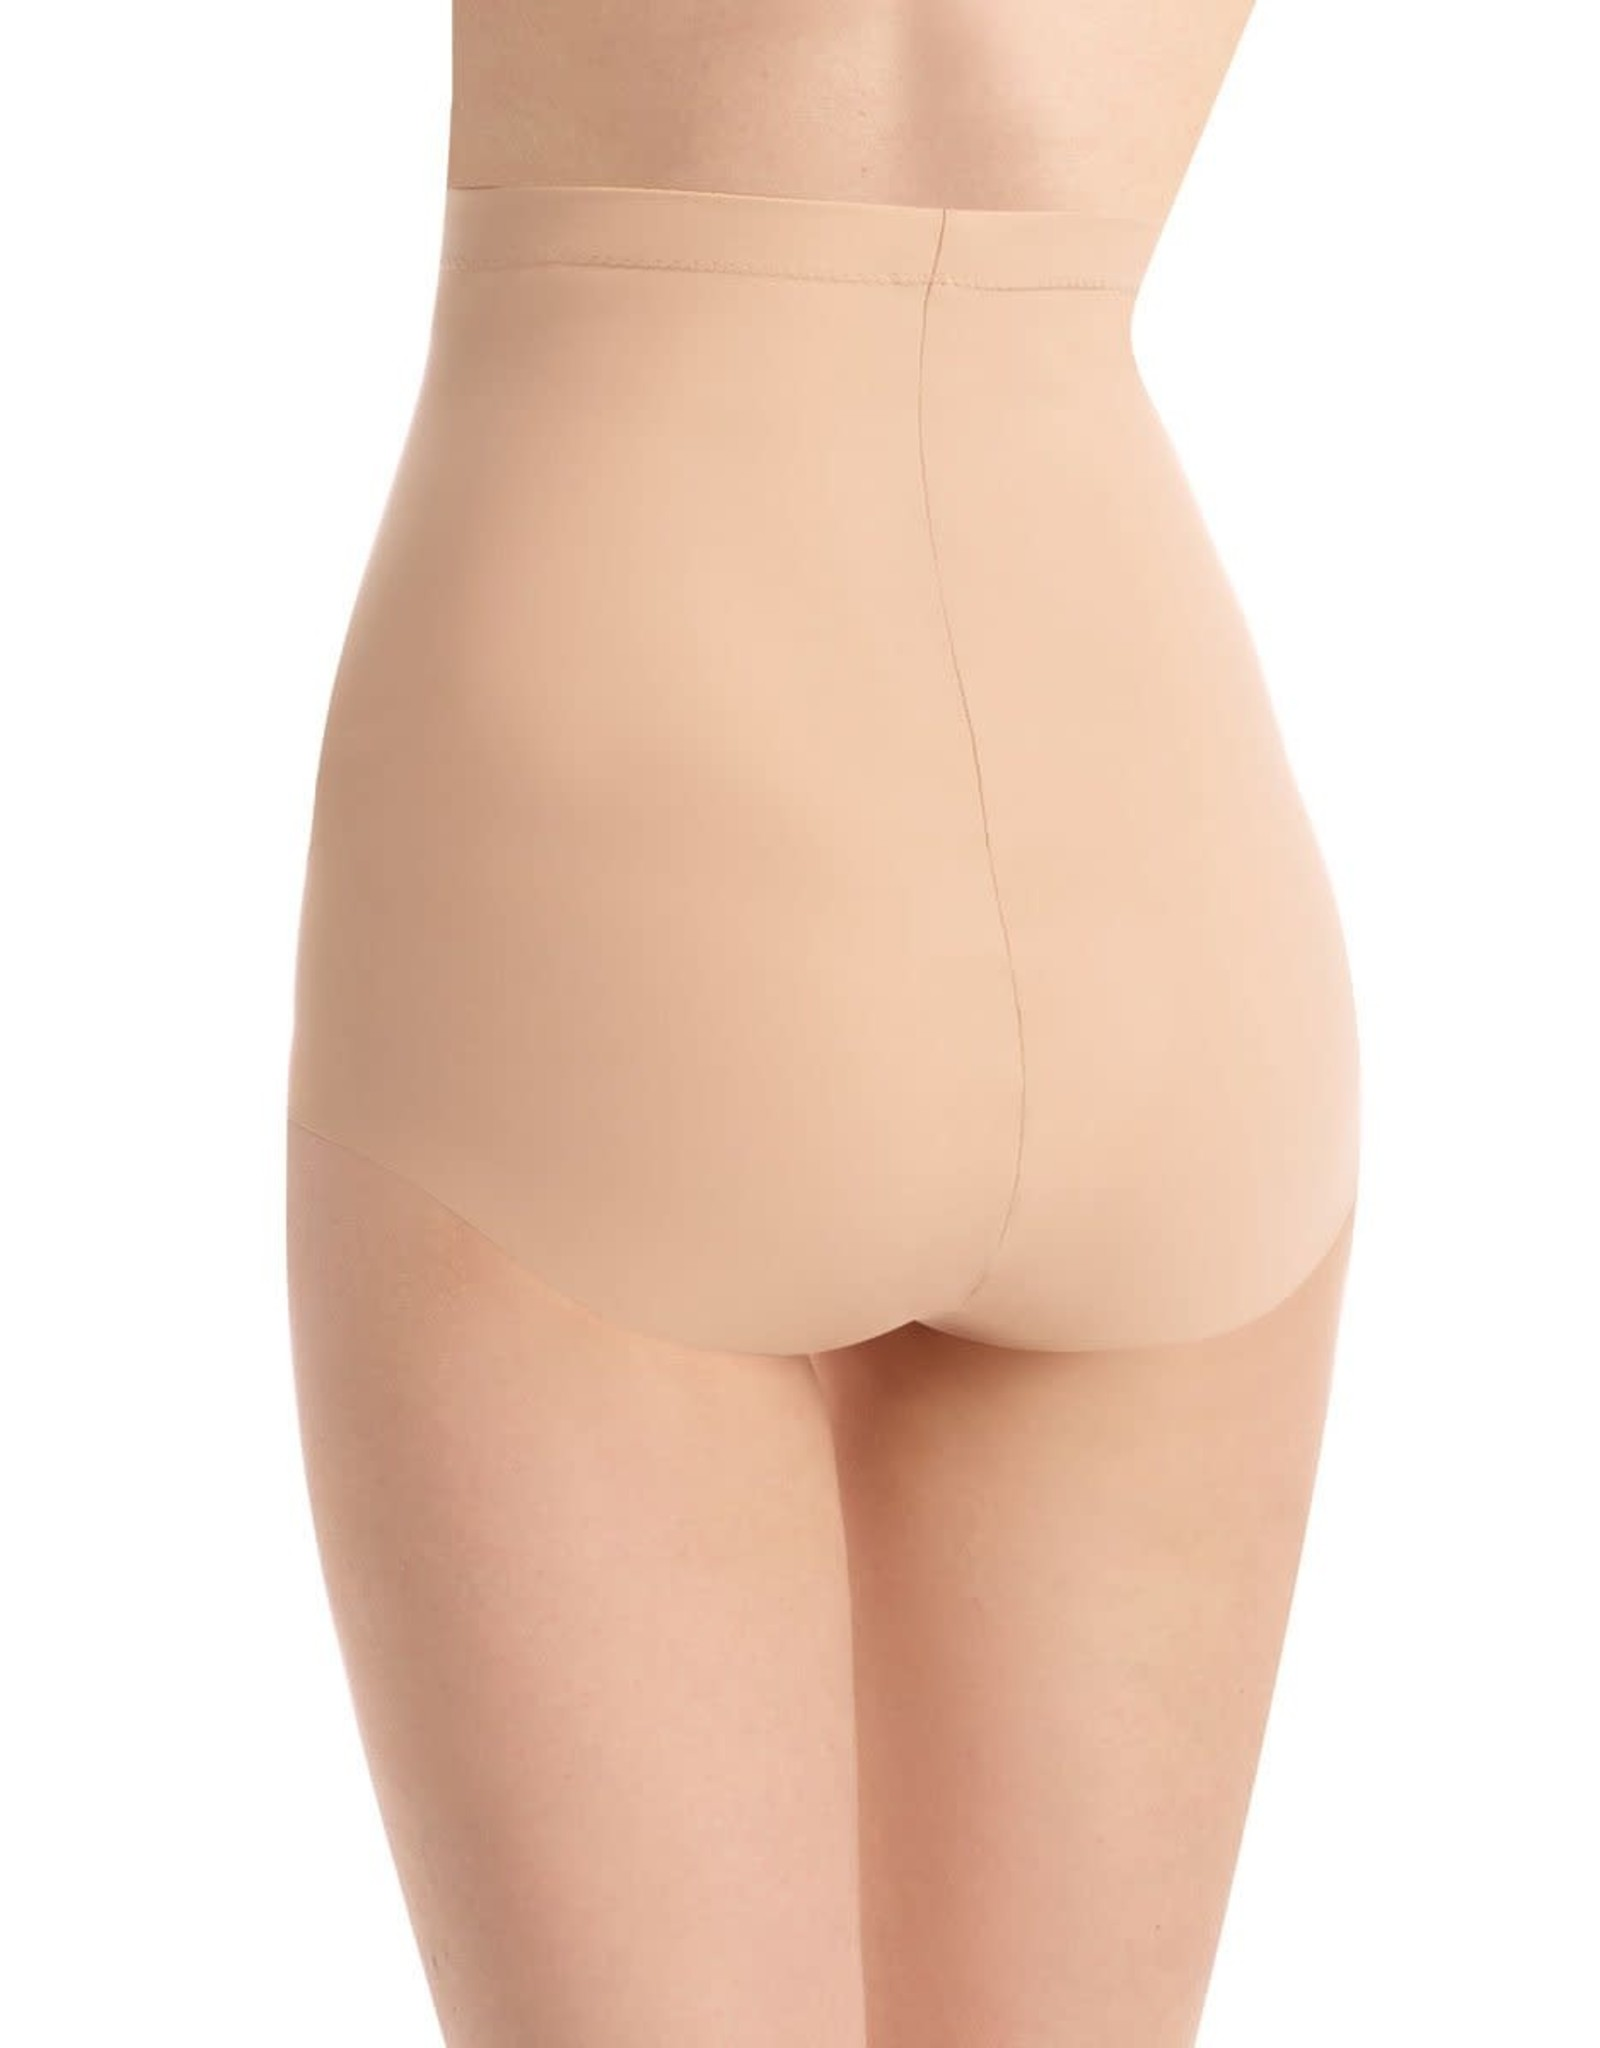 Commando Classic Control High Waist Panty